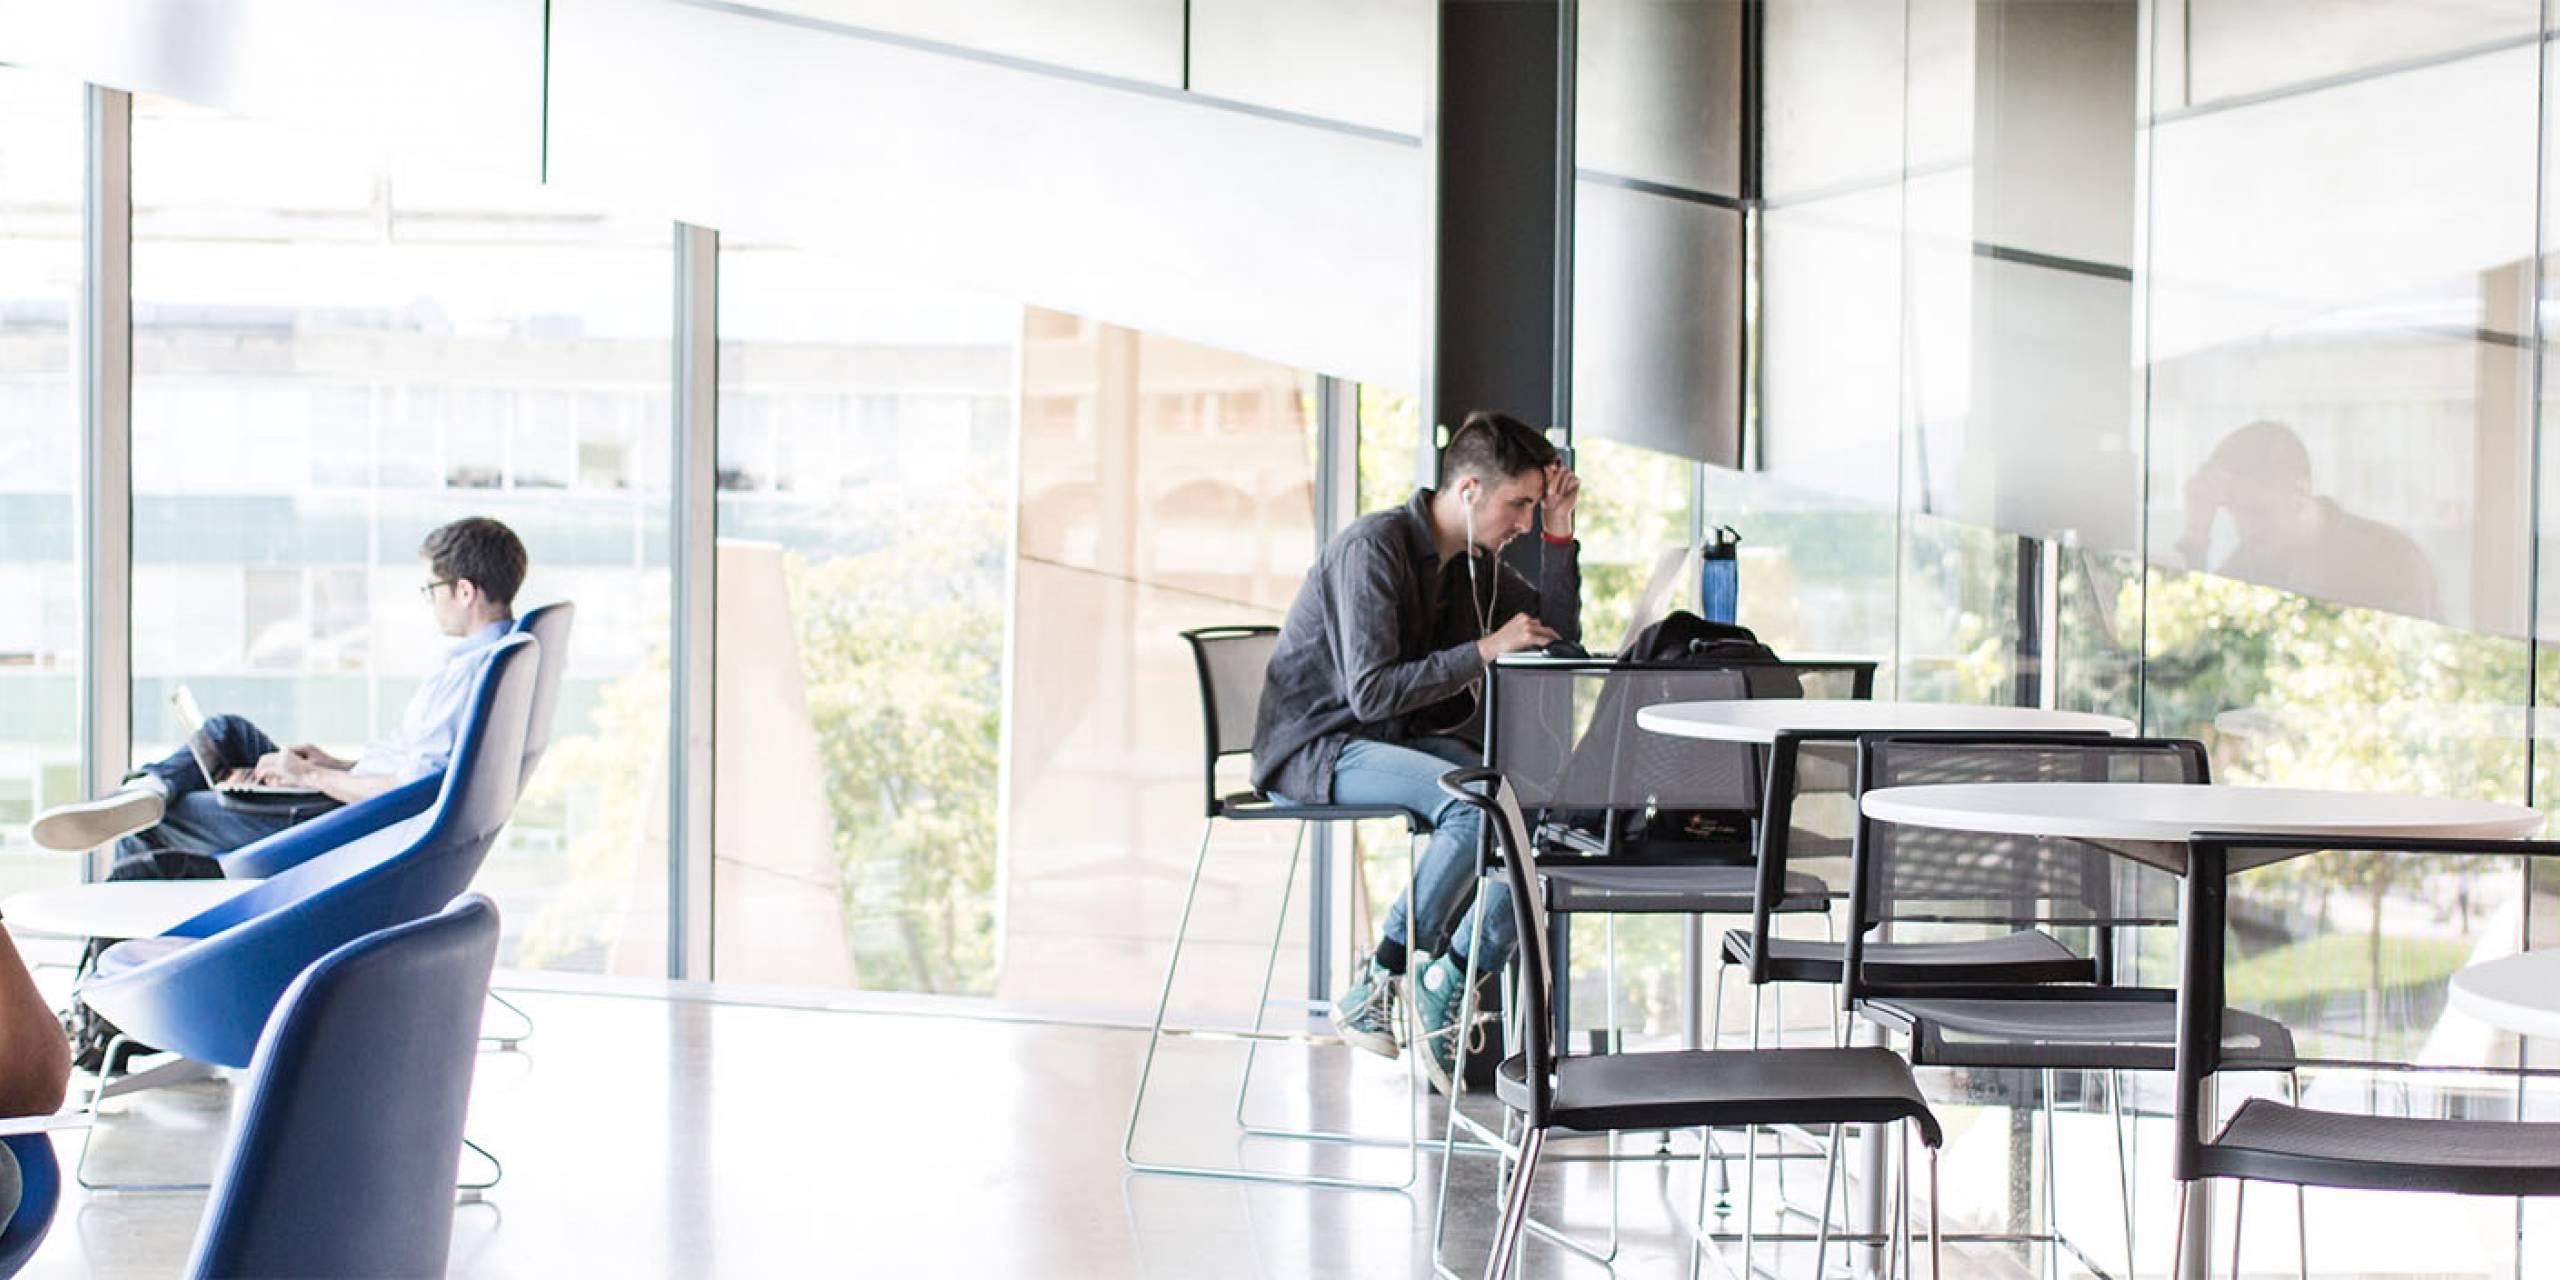 university of washington thesis format guidelines